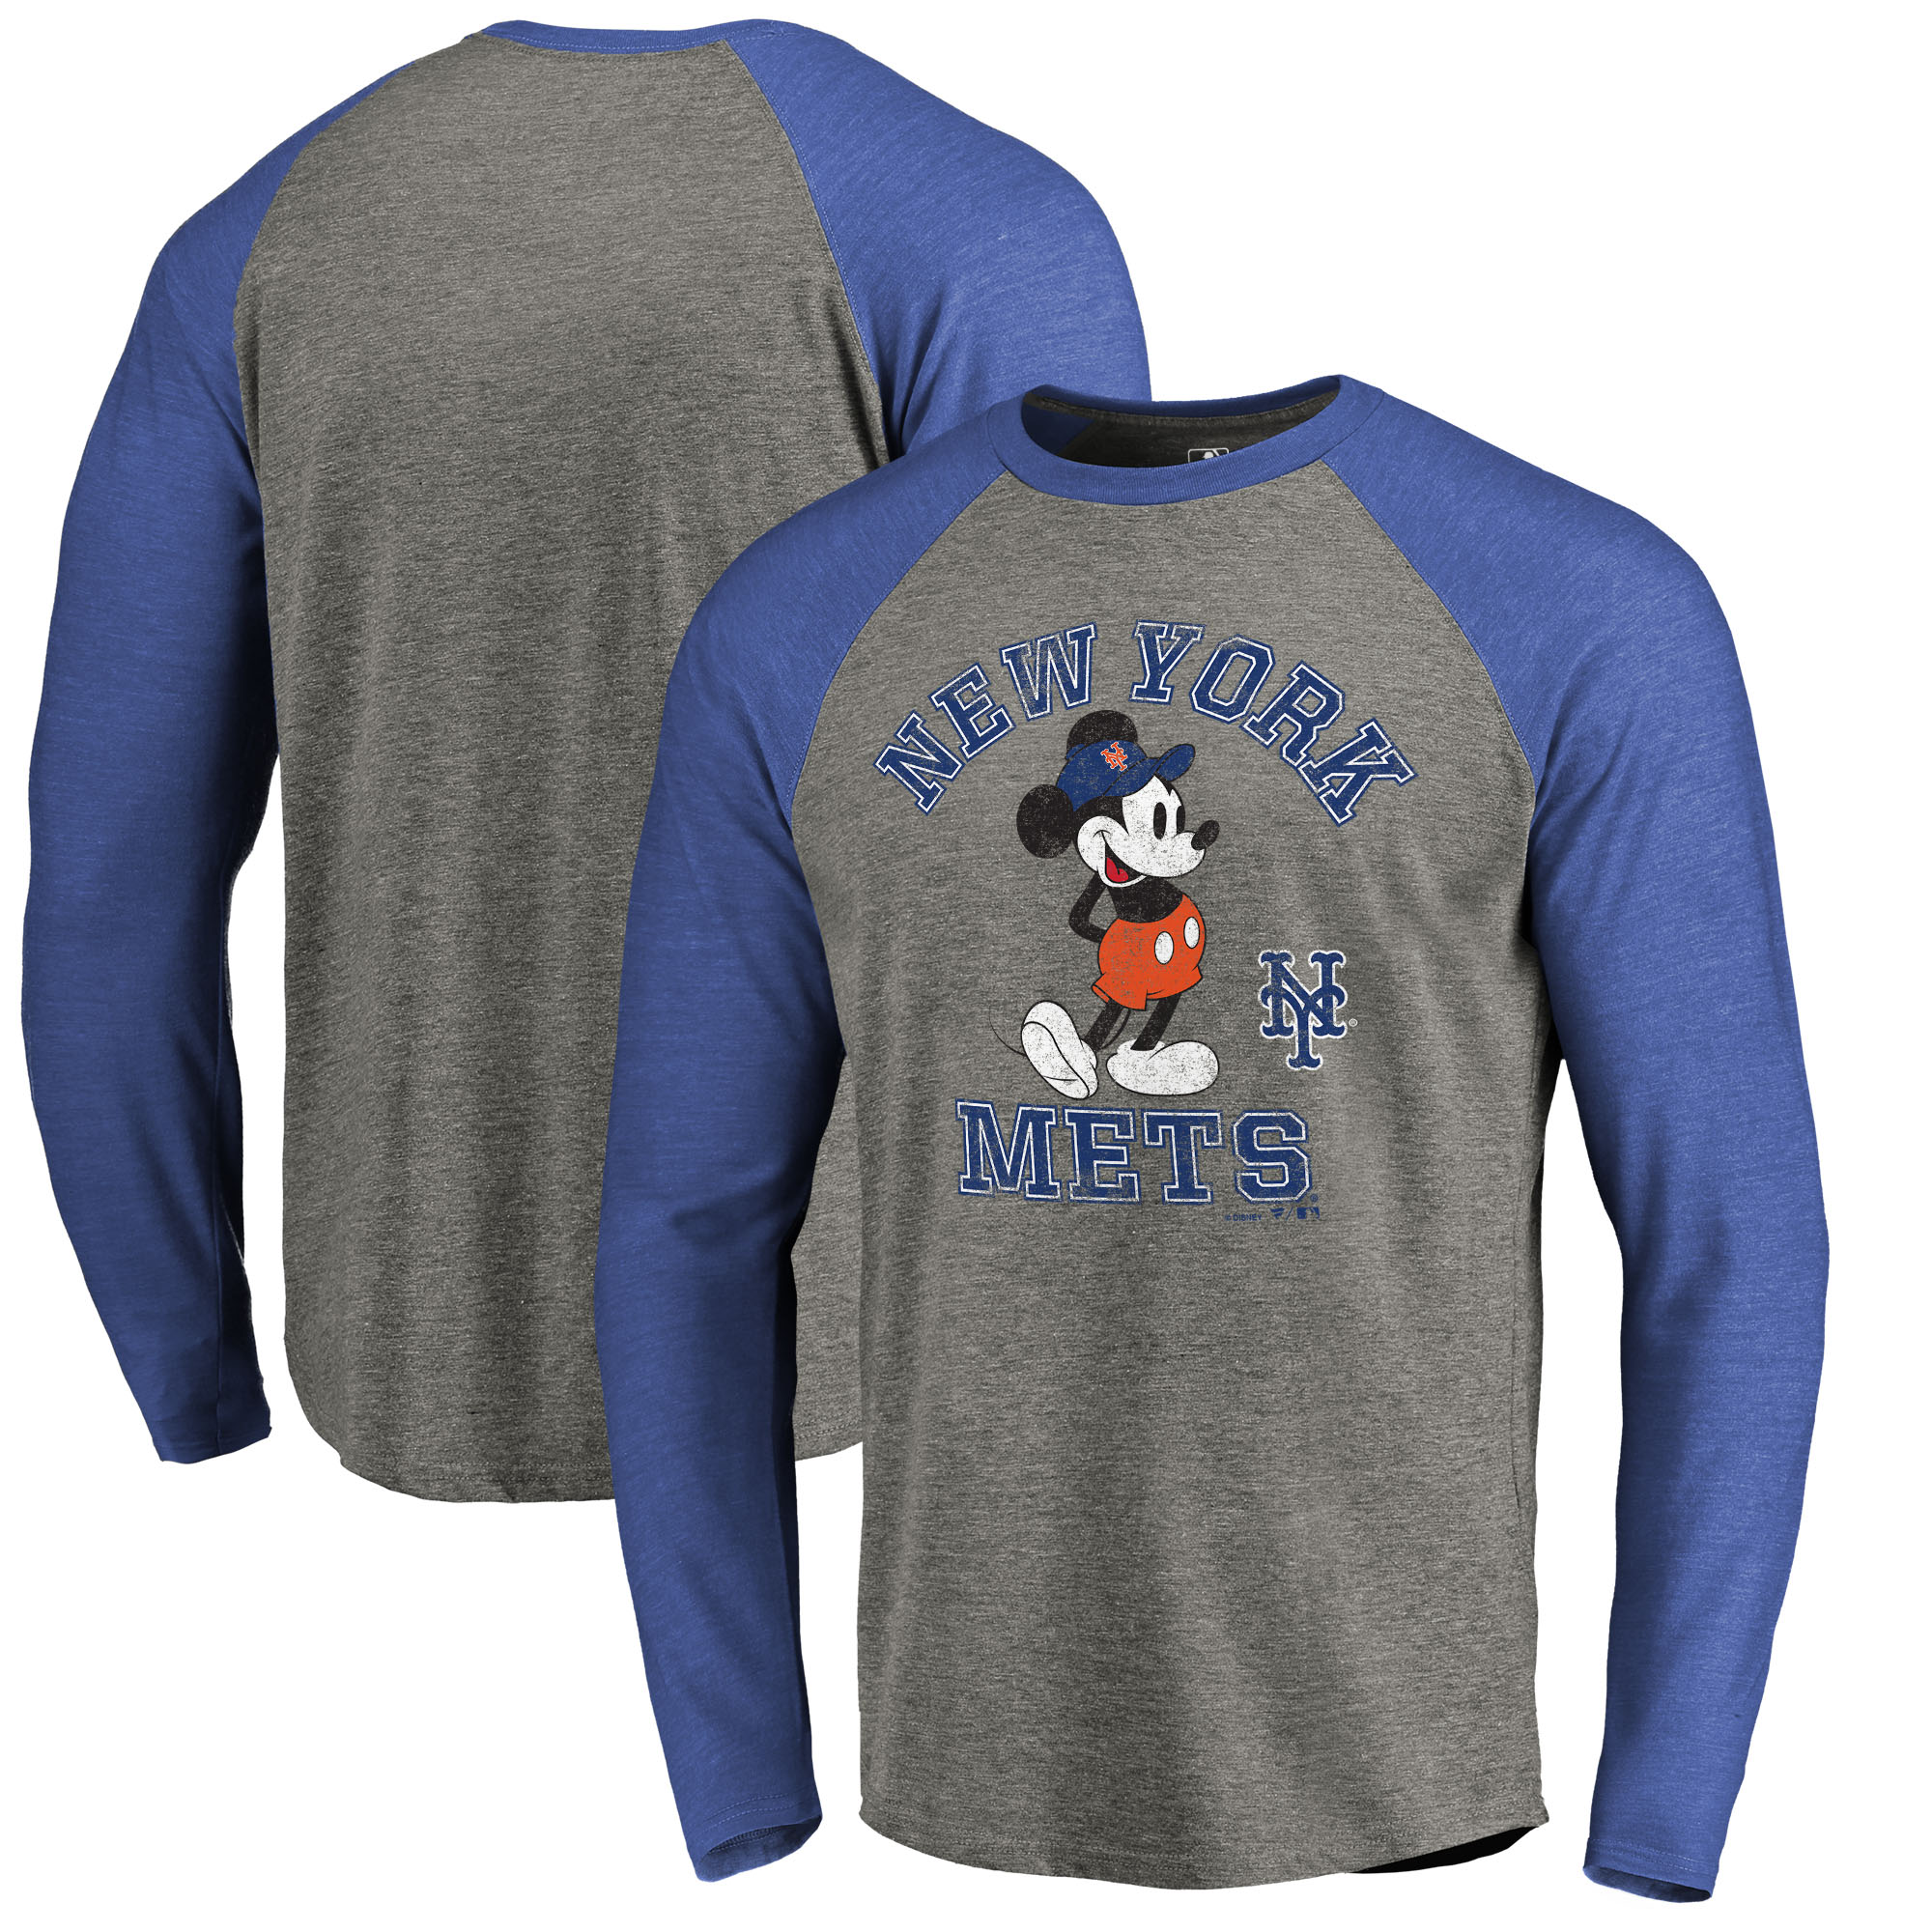 New York Mets Fanatics Branded Disney MLB Tradition Long Sleeve Tri-Blend T-Shirt - Heathered Gray